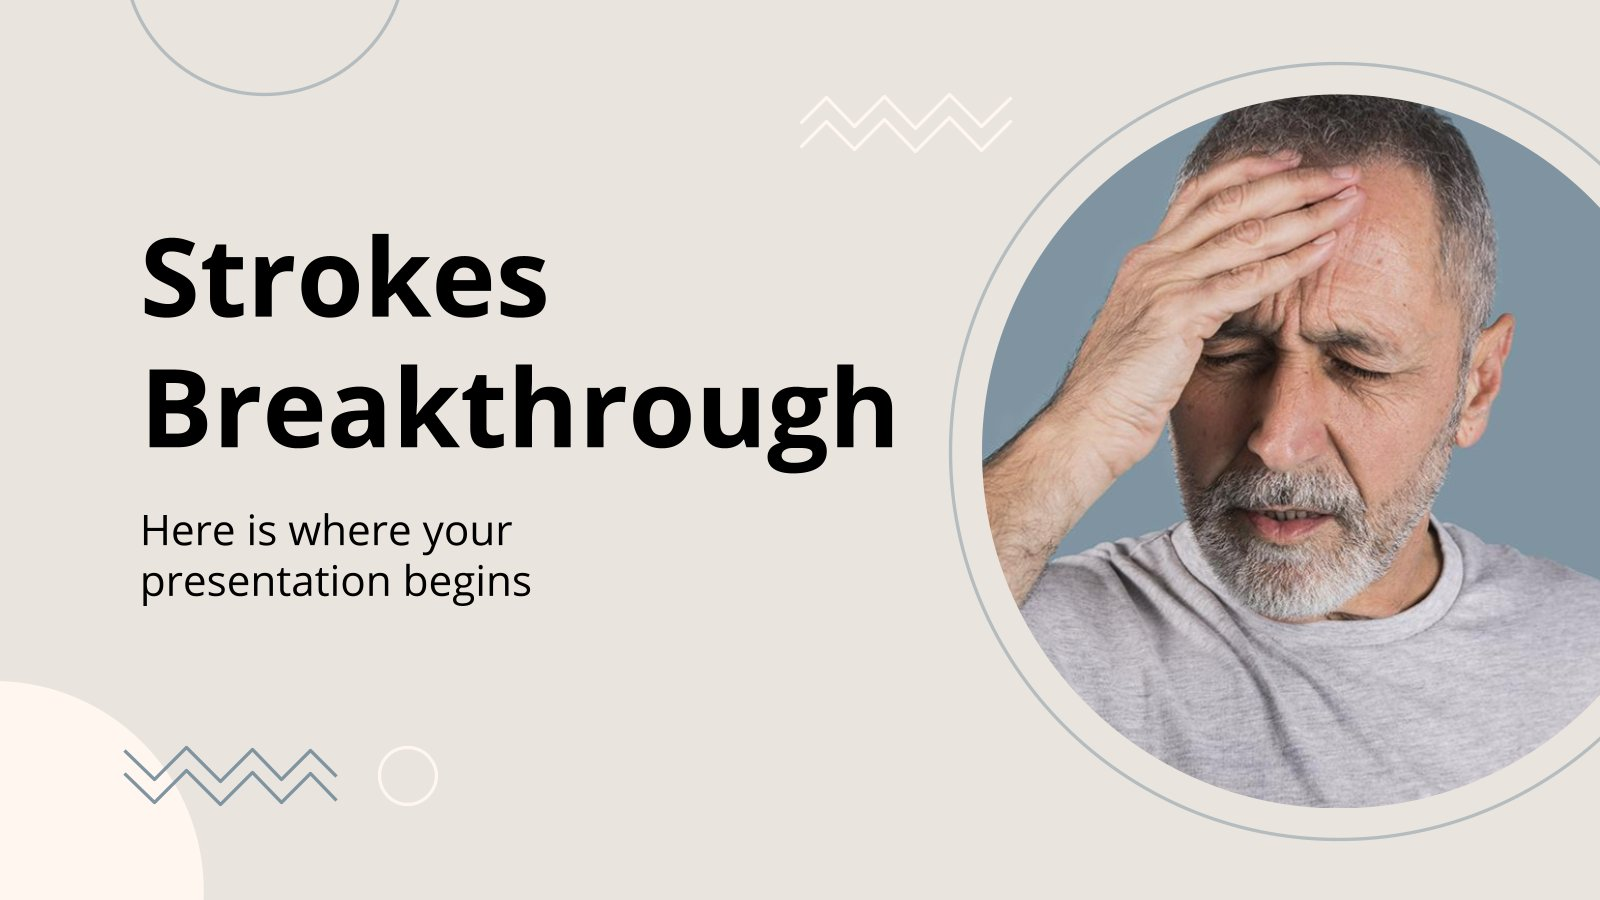 Strokes Breakthrough presentation template